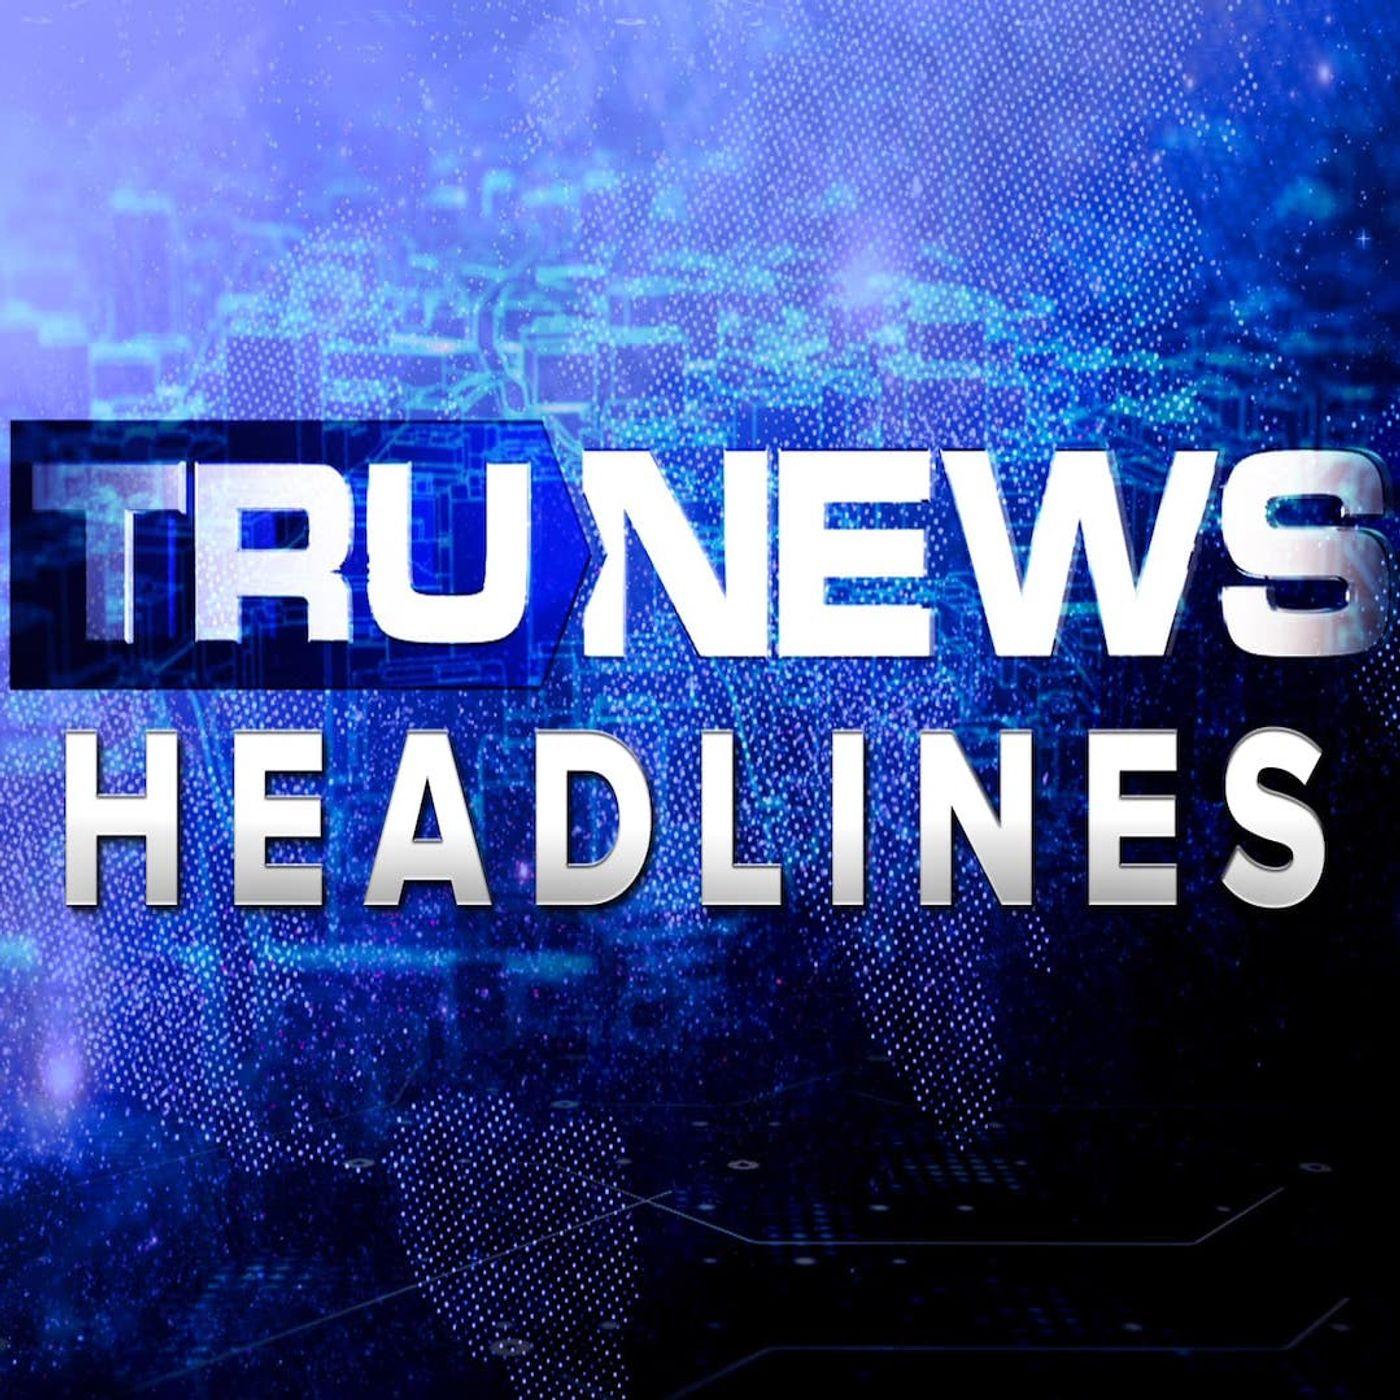 TruNews Headlines